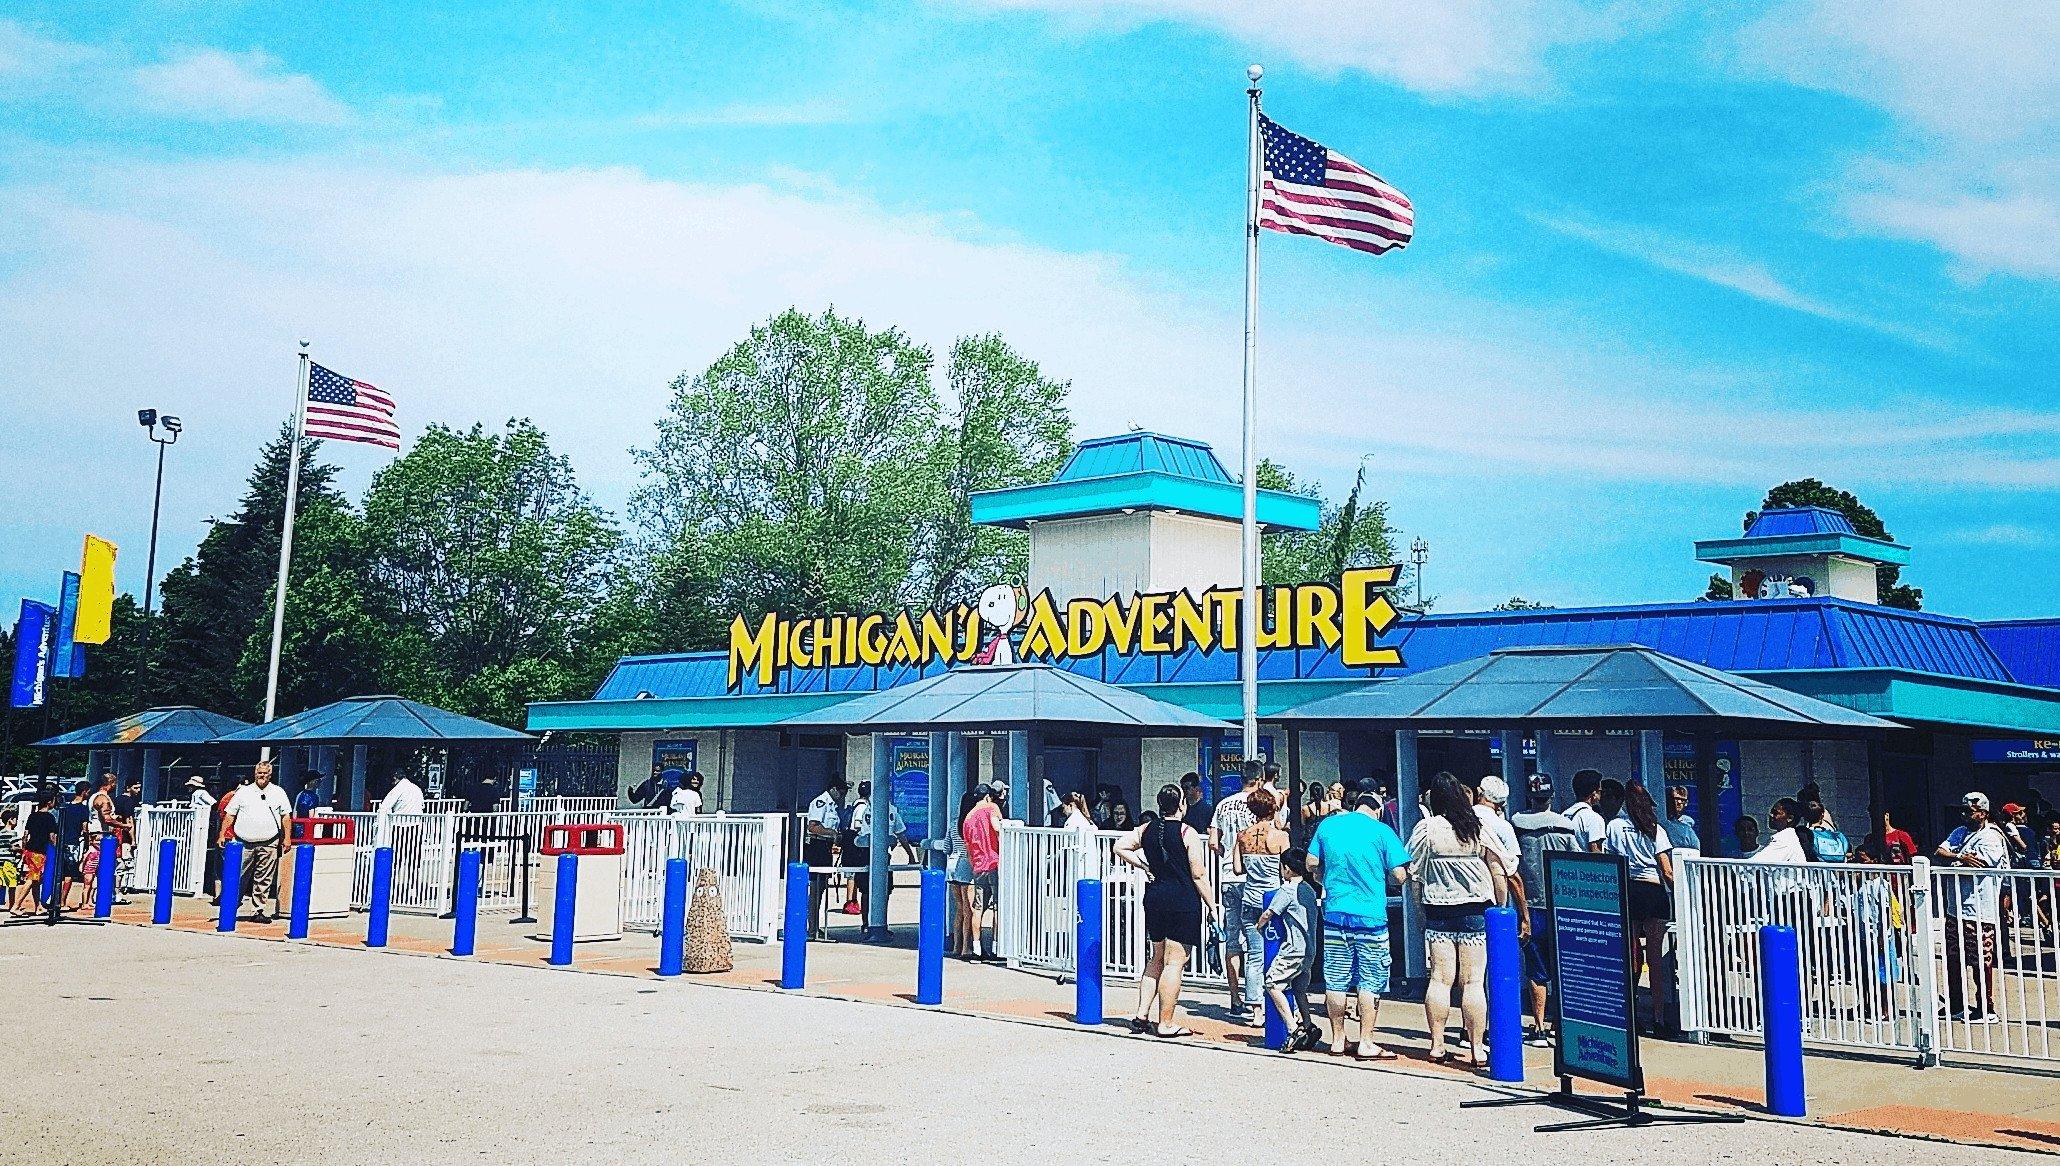 untitled 17 Reasons To Visit Michigan's Adventure Amusement Park & Water Park